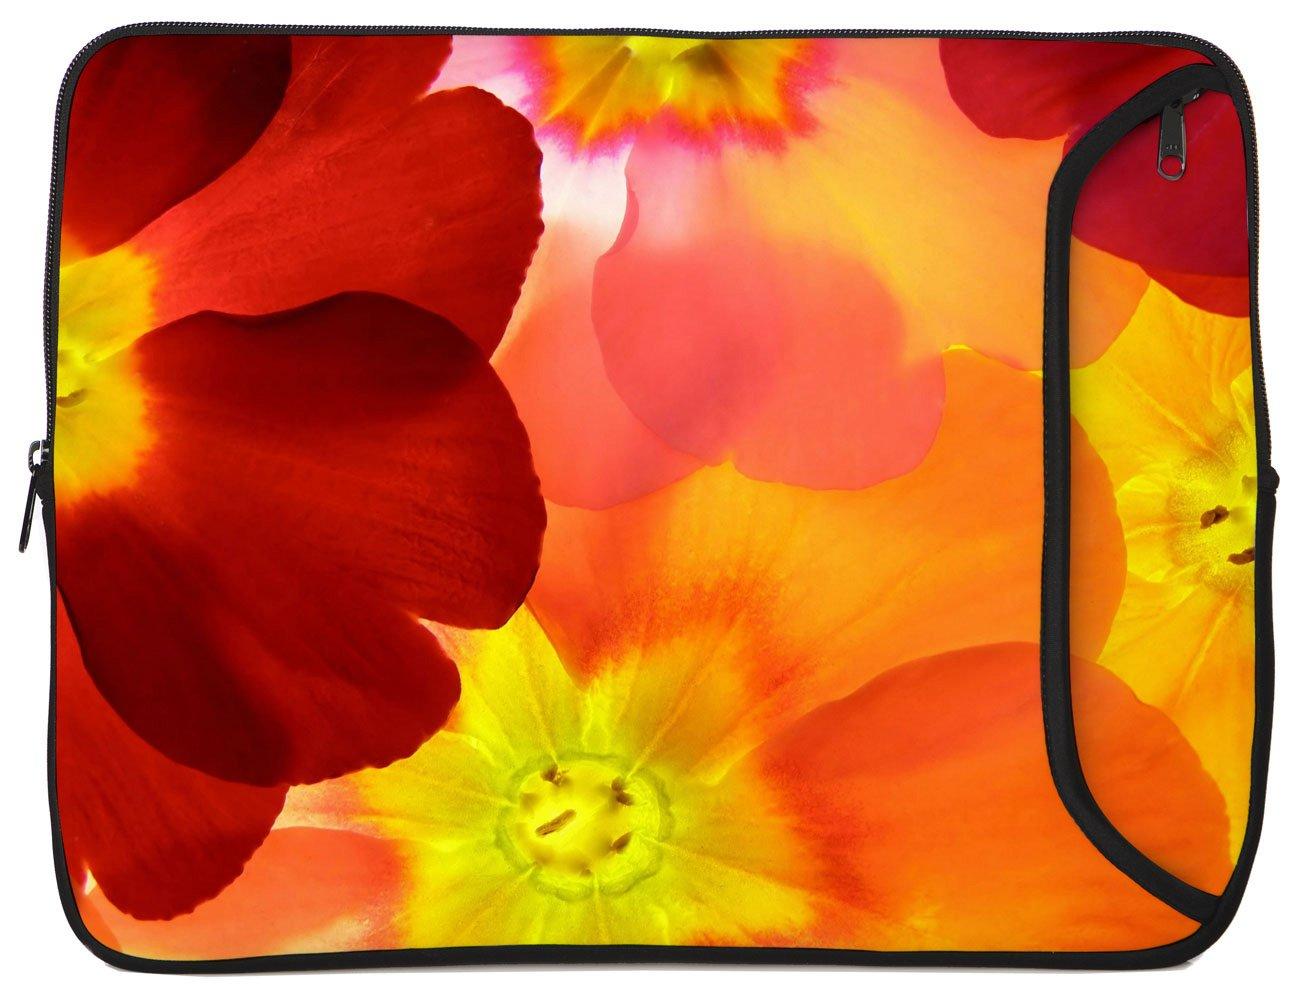 Designer Sleeves Spring Flower Sleeve for 10-Inch iPad/Tablet, Orange (10DS-SF) by Designer Sleeves (Image #1)